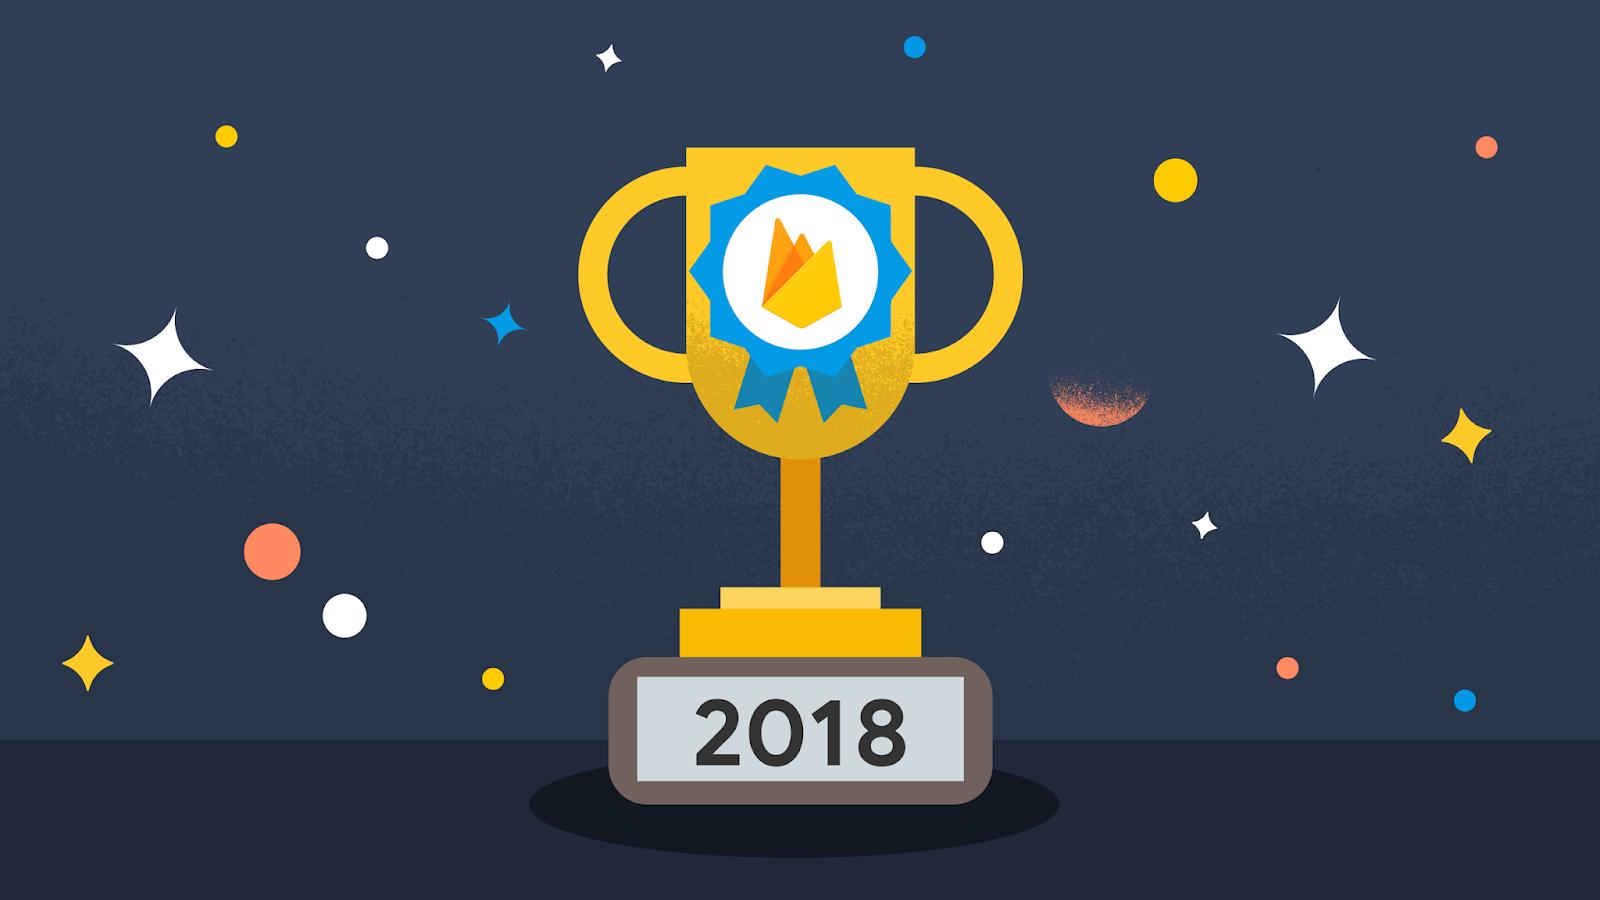 The Firebase Blog: Countdown to 2019, Firebase style